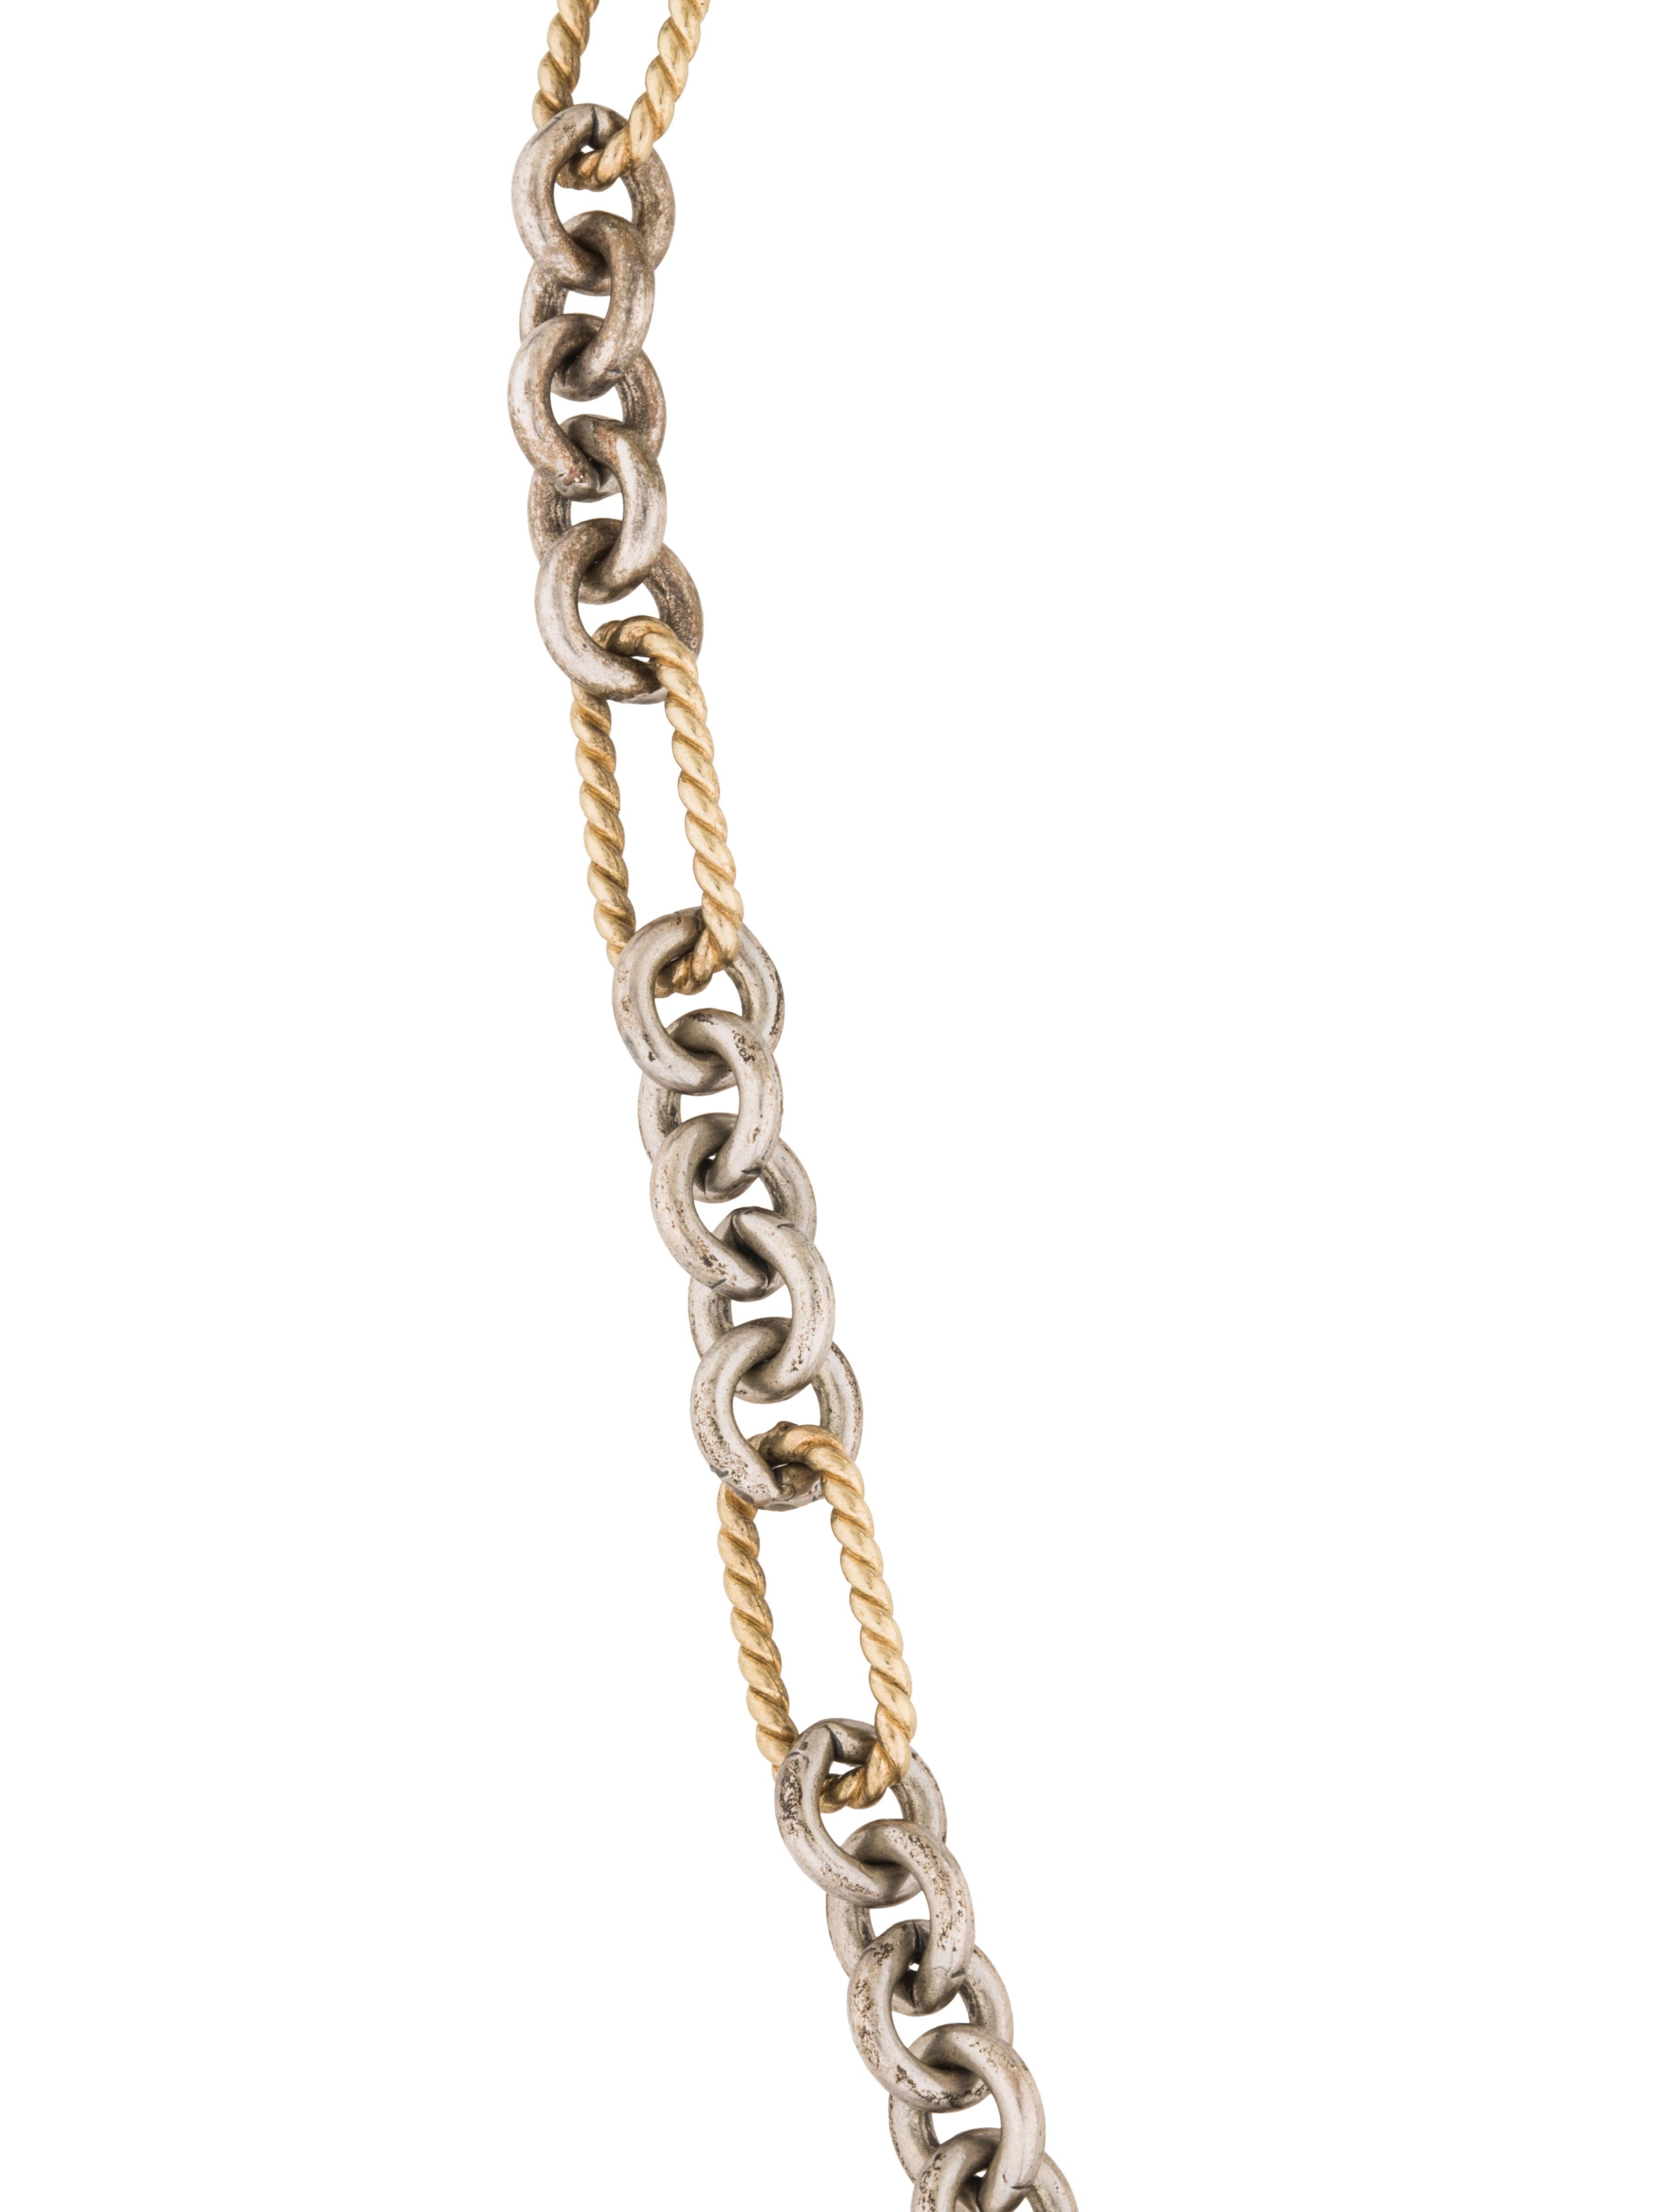 David Yurman Two Tone Figaro Chain Necklace Necklaces